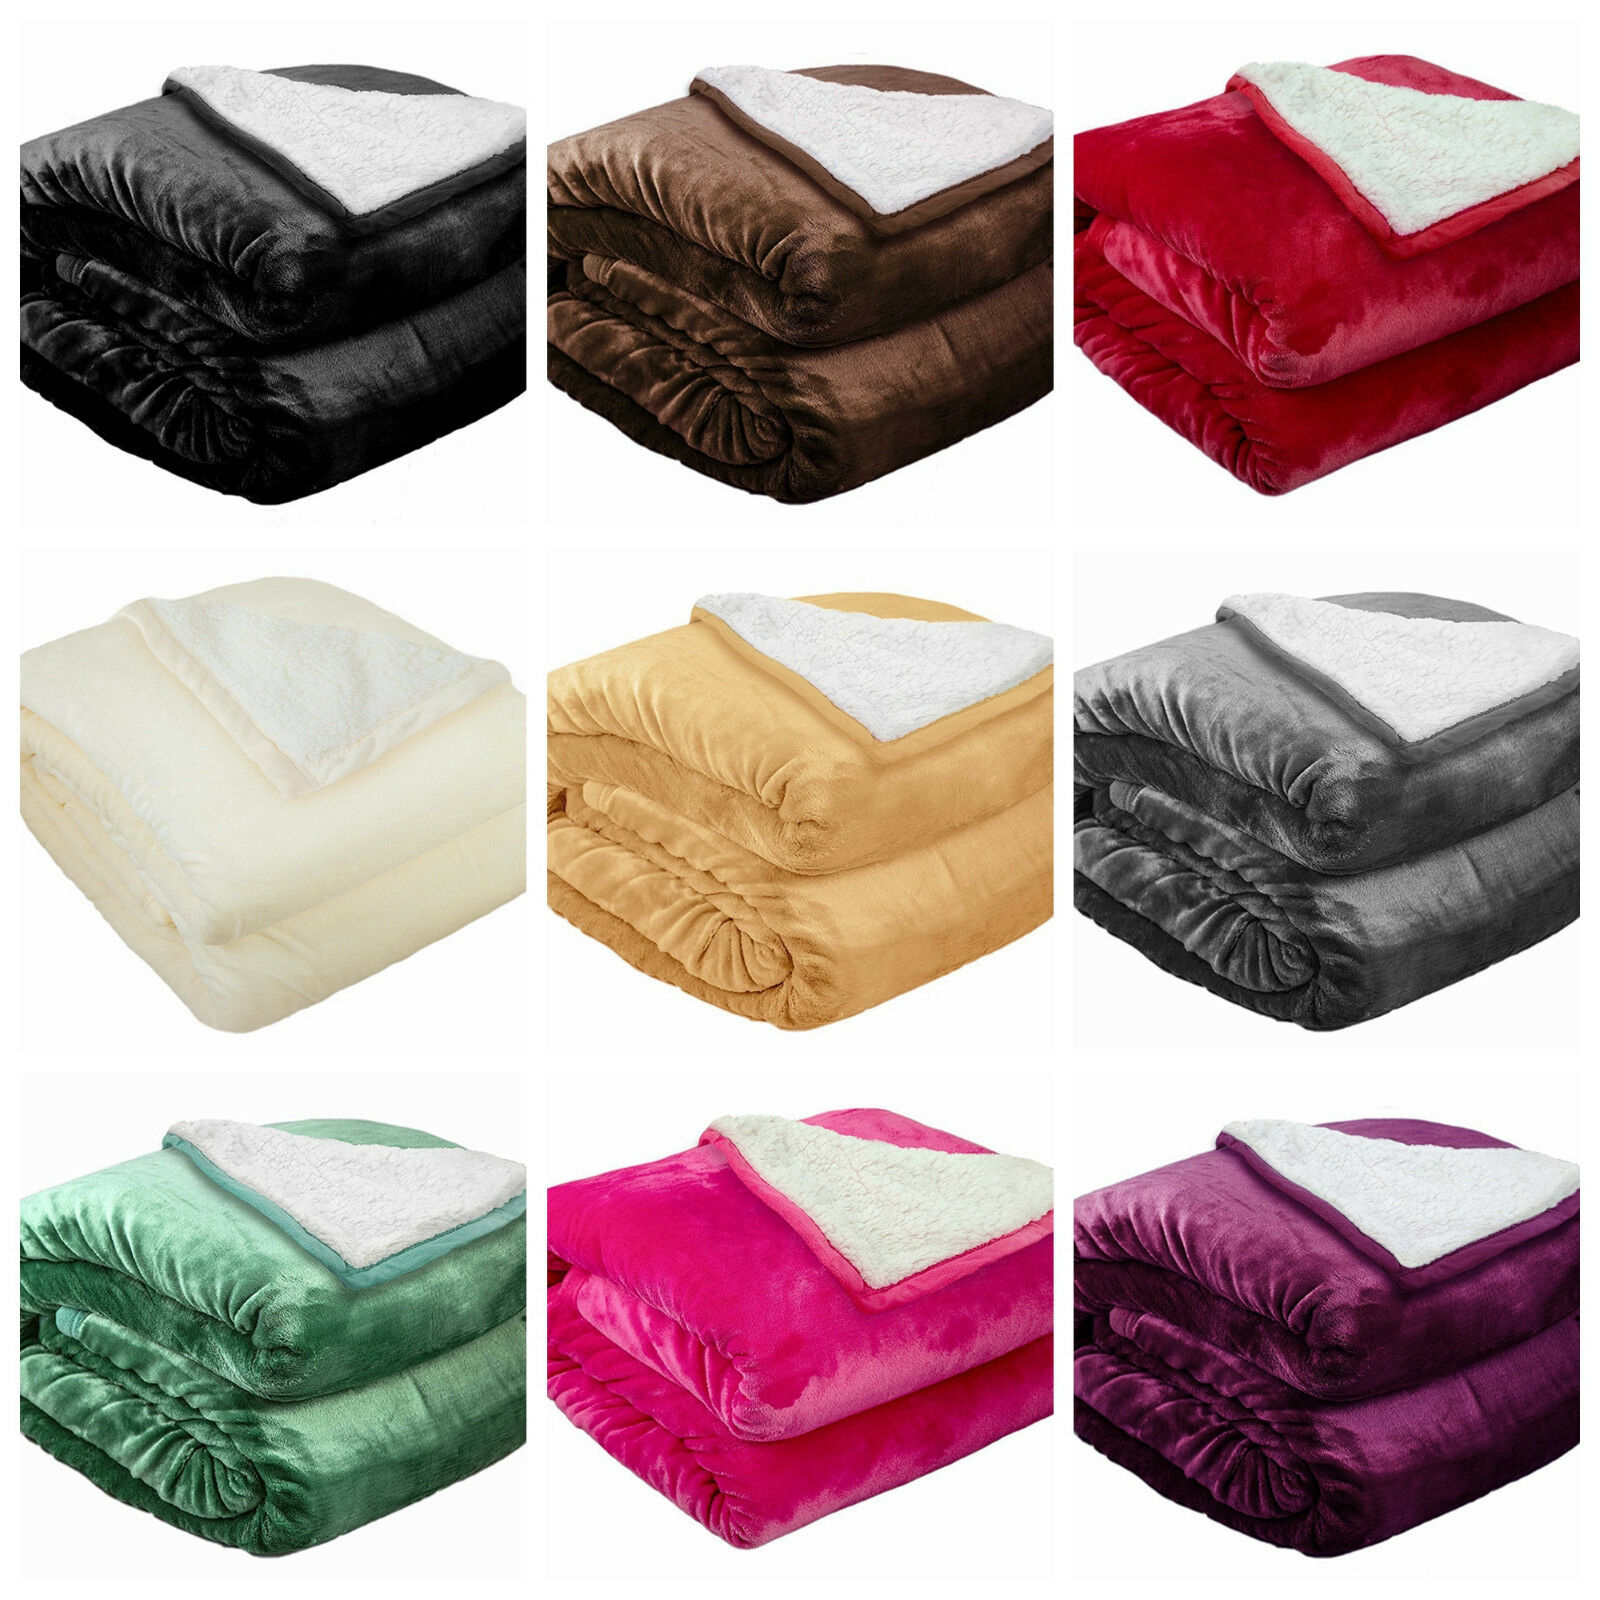 Sherpa Throw Blanket Plush Super Soft  Cozy Winter Borrego Blanket Queen Size